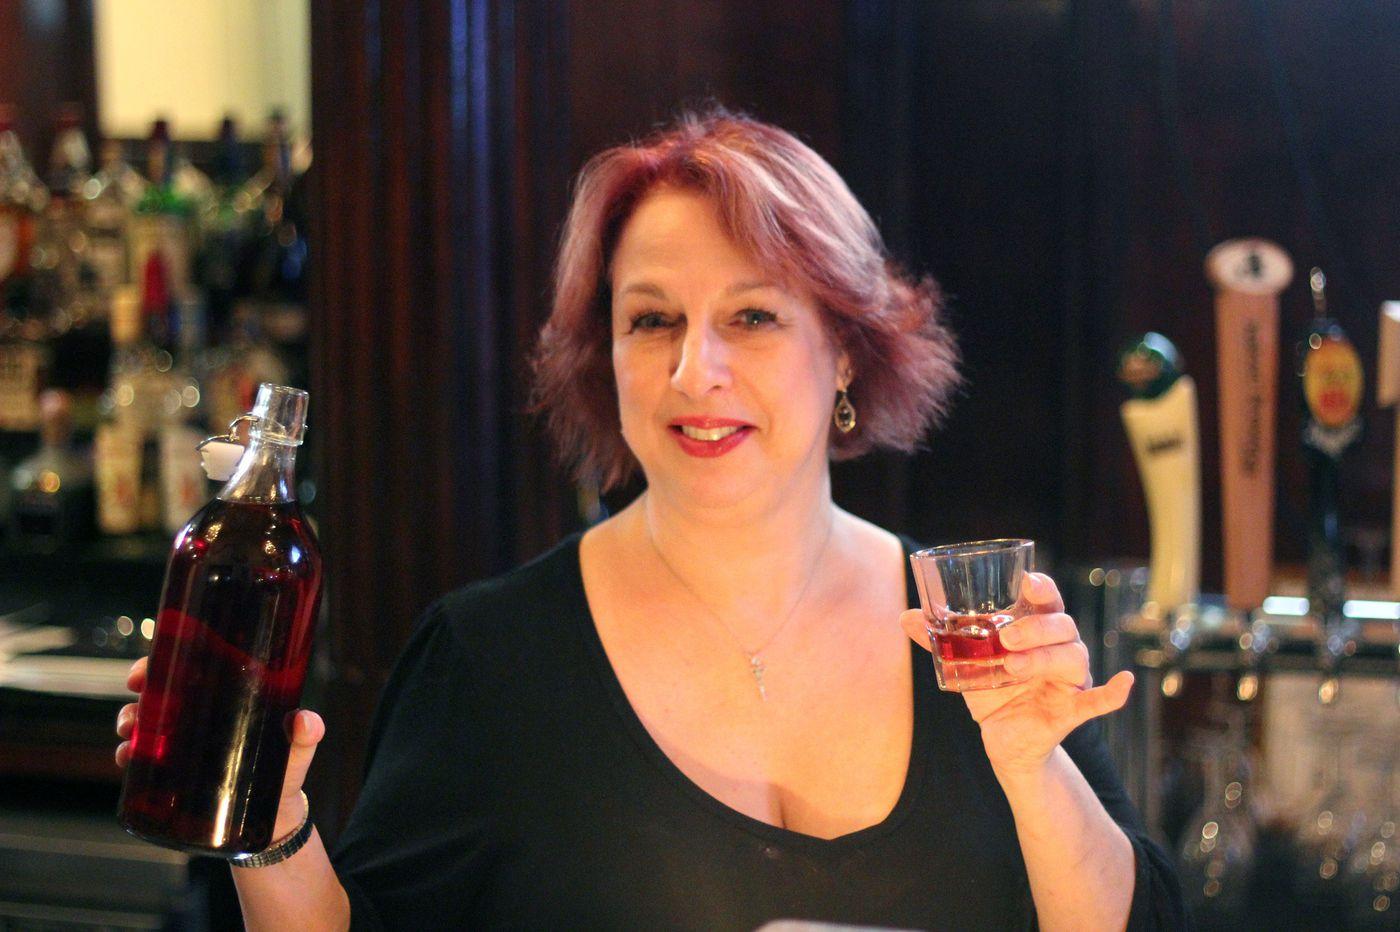 Restaurant community remembering Katie Loeb